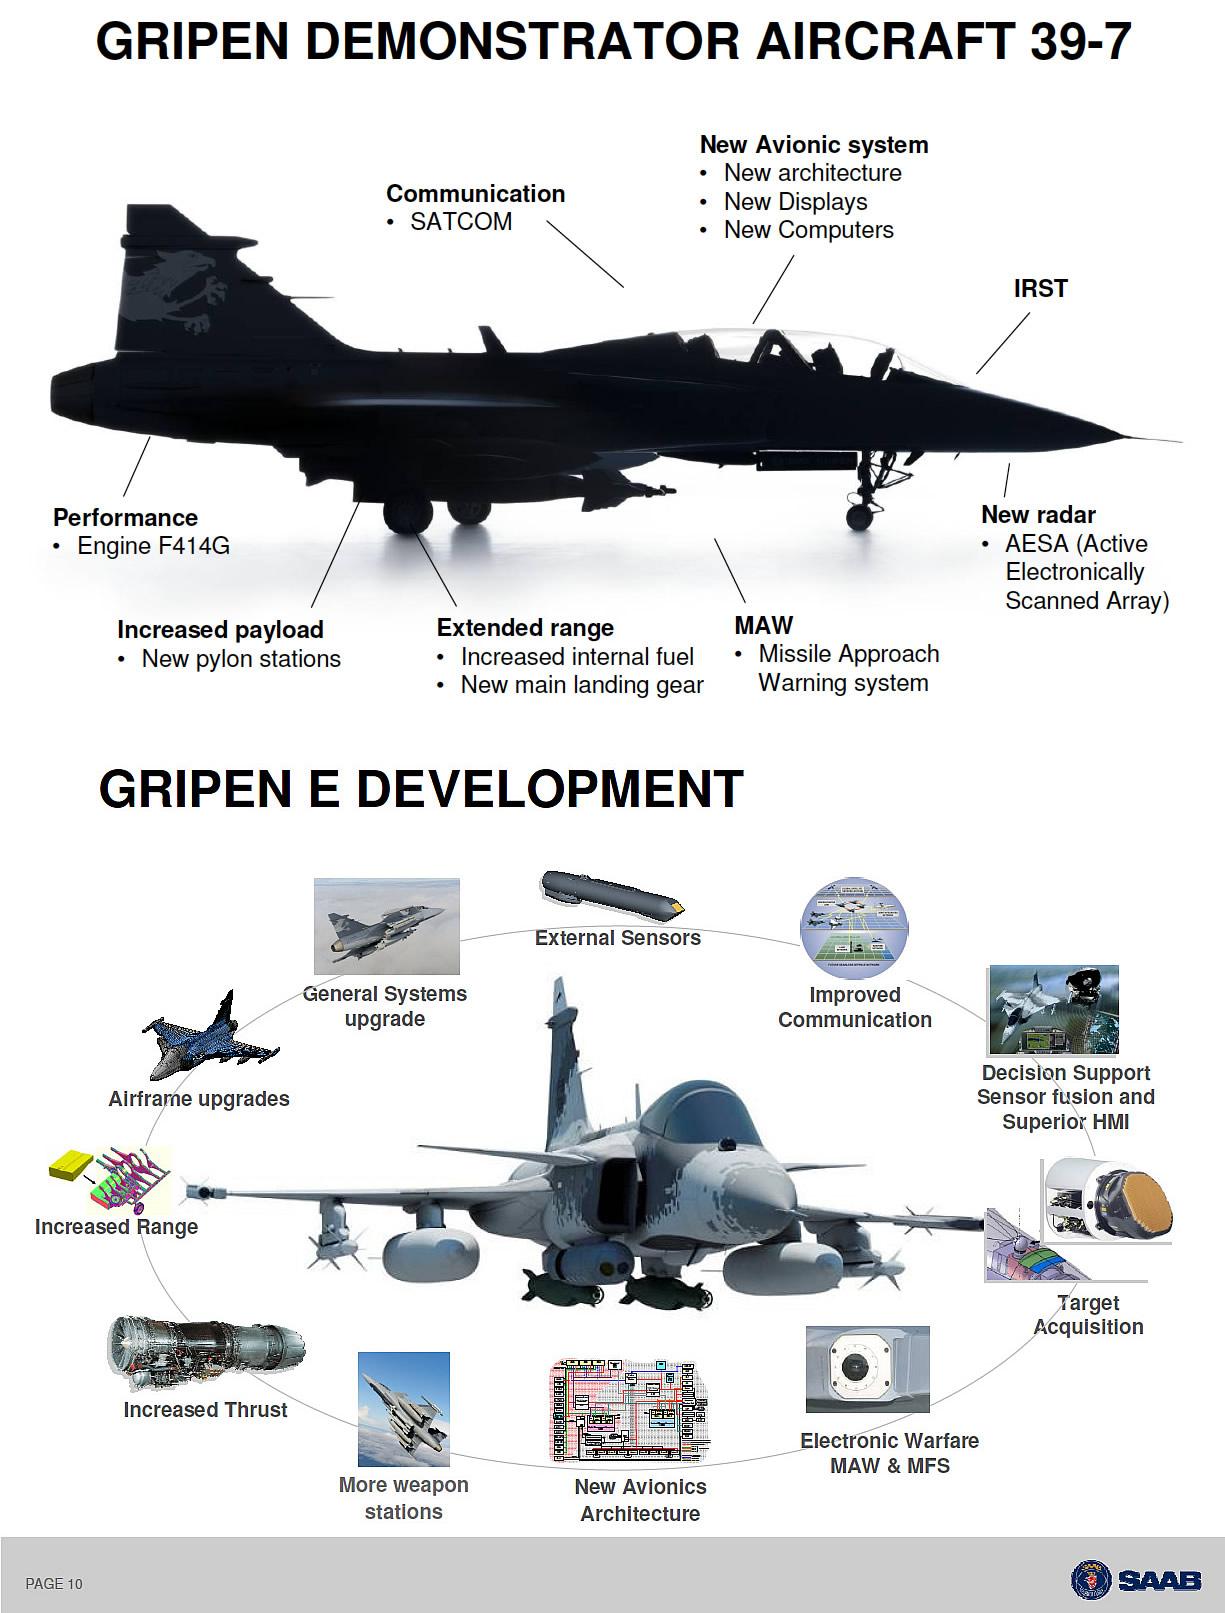 PUB_JAS-39NG_Gripen_Evolution_Saab-DID_lg